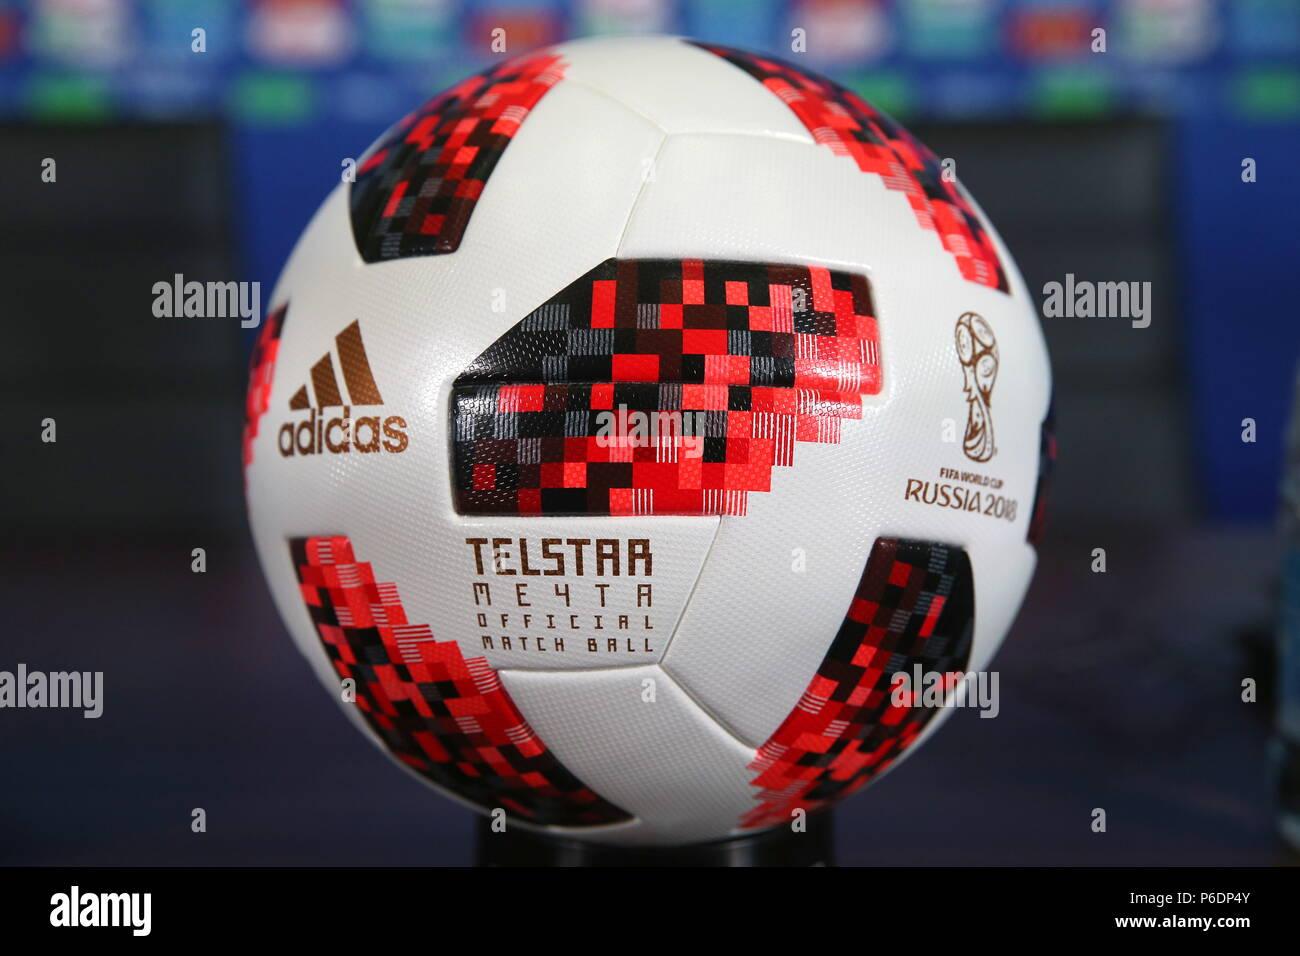 Telstar Mechta Imágenes De Stock   Telstar Mechta Fotos De Stock - Alamy 1eb0aa4c43fa4